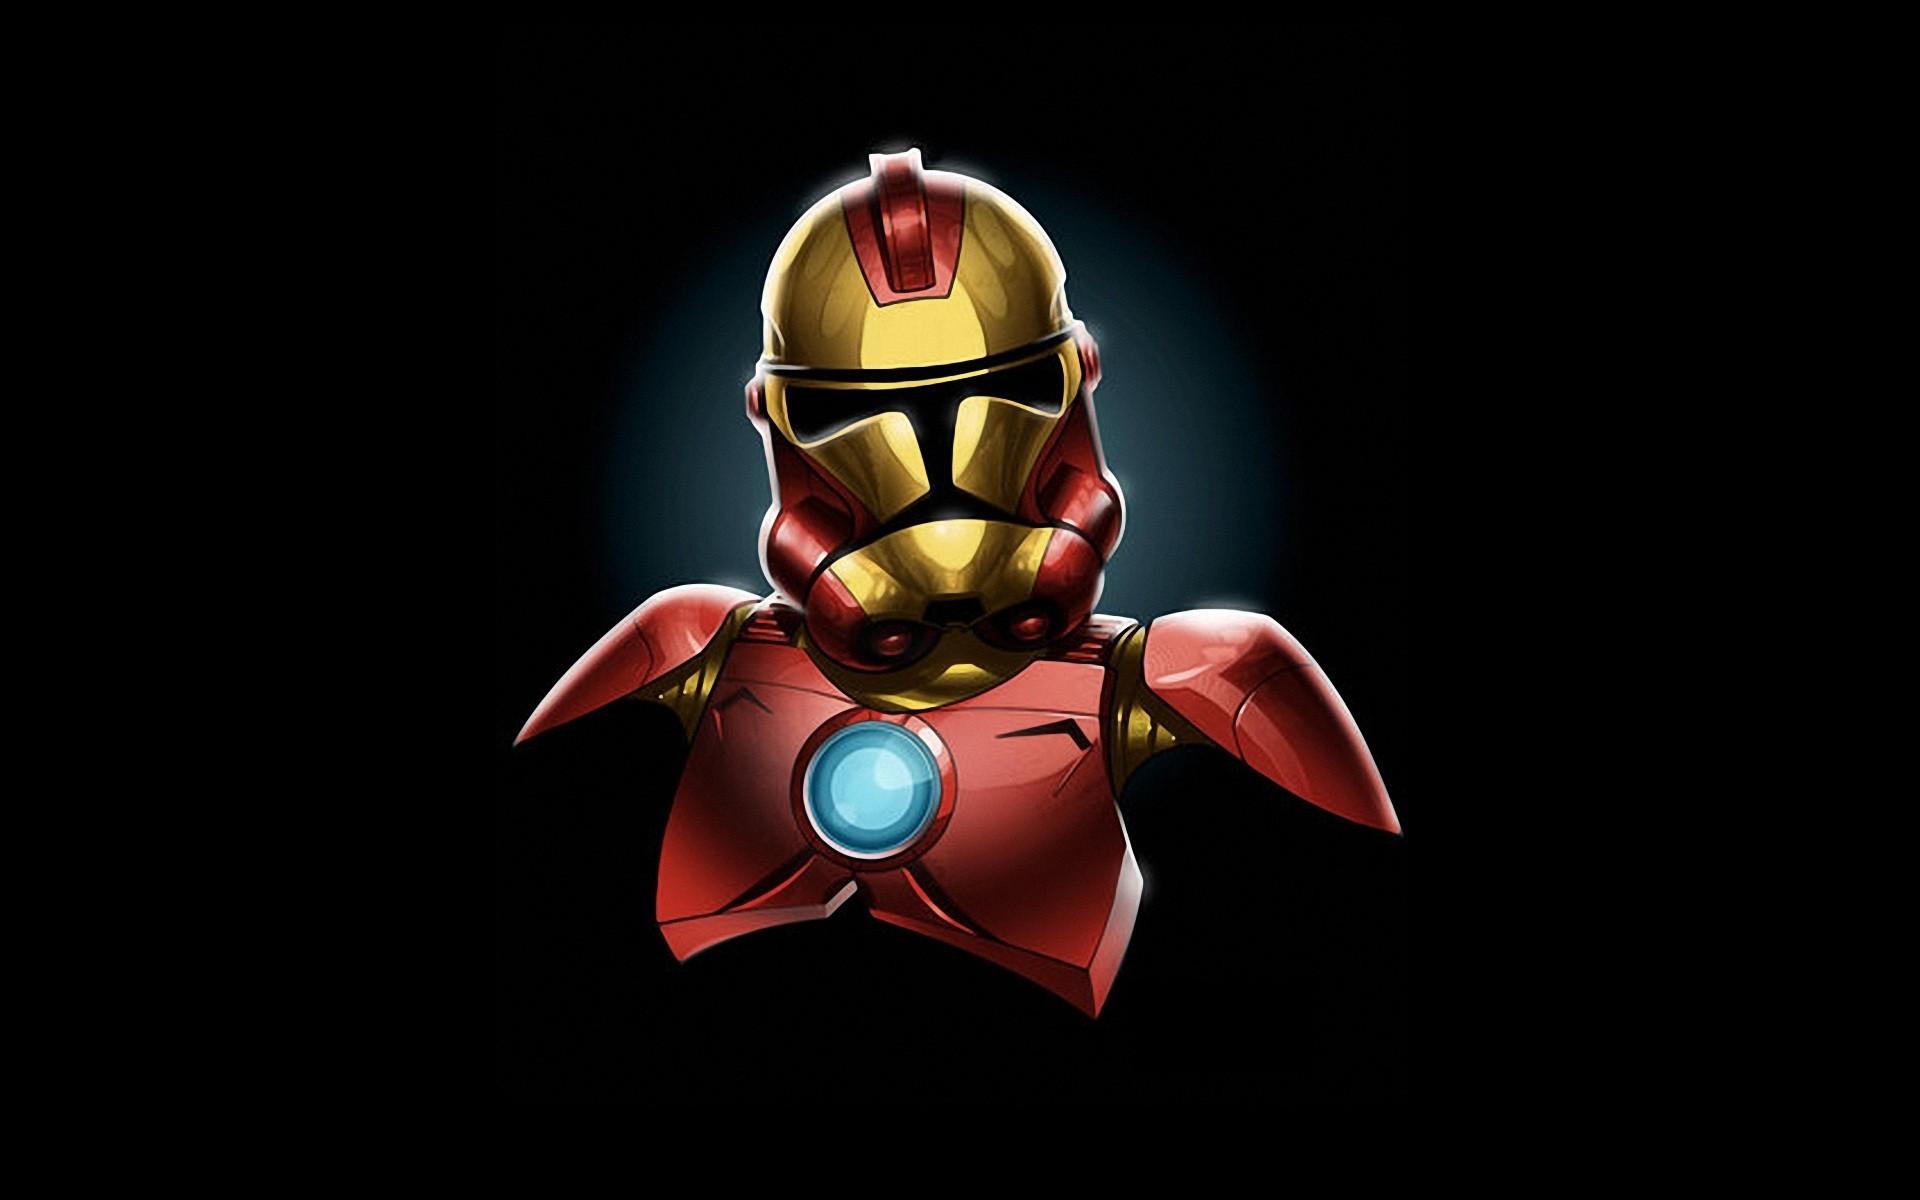 Star Wars Minimalistic Iron Man Stormtroopers Marvel Comics Wallpaper At 3d  Wallpapers